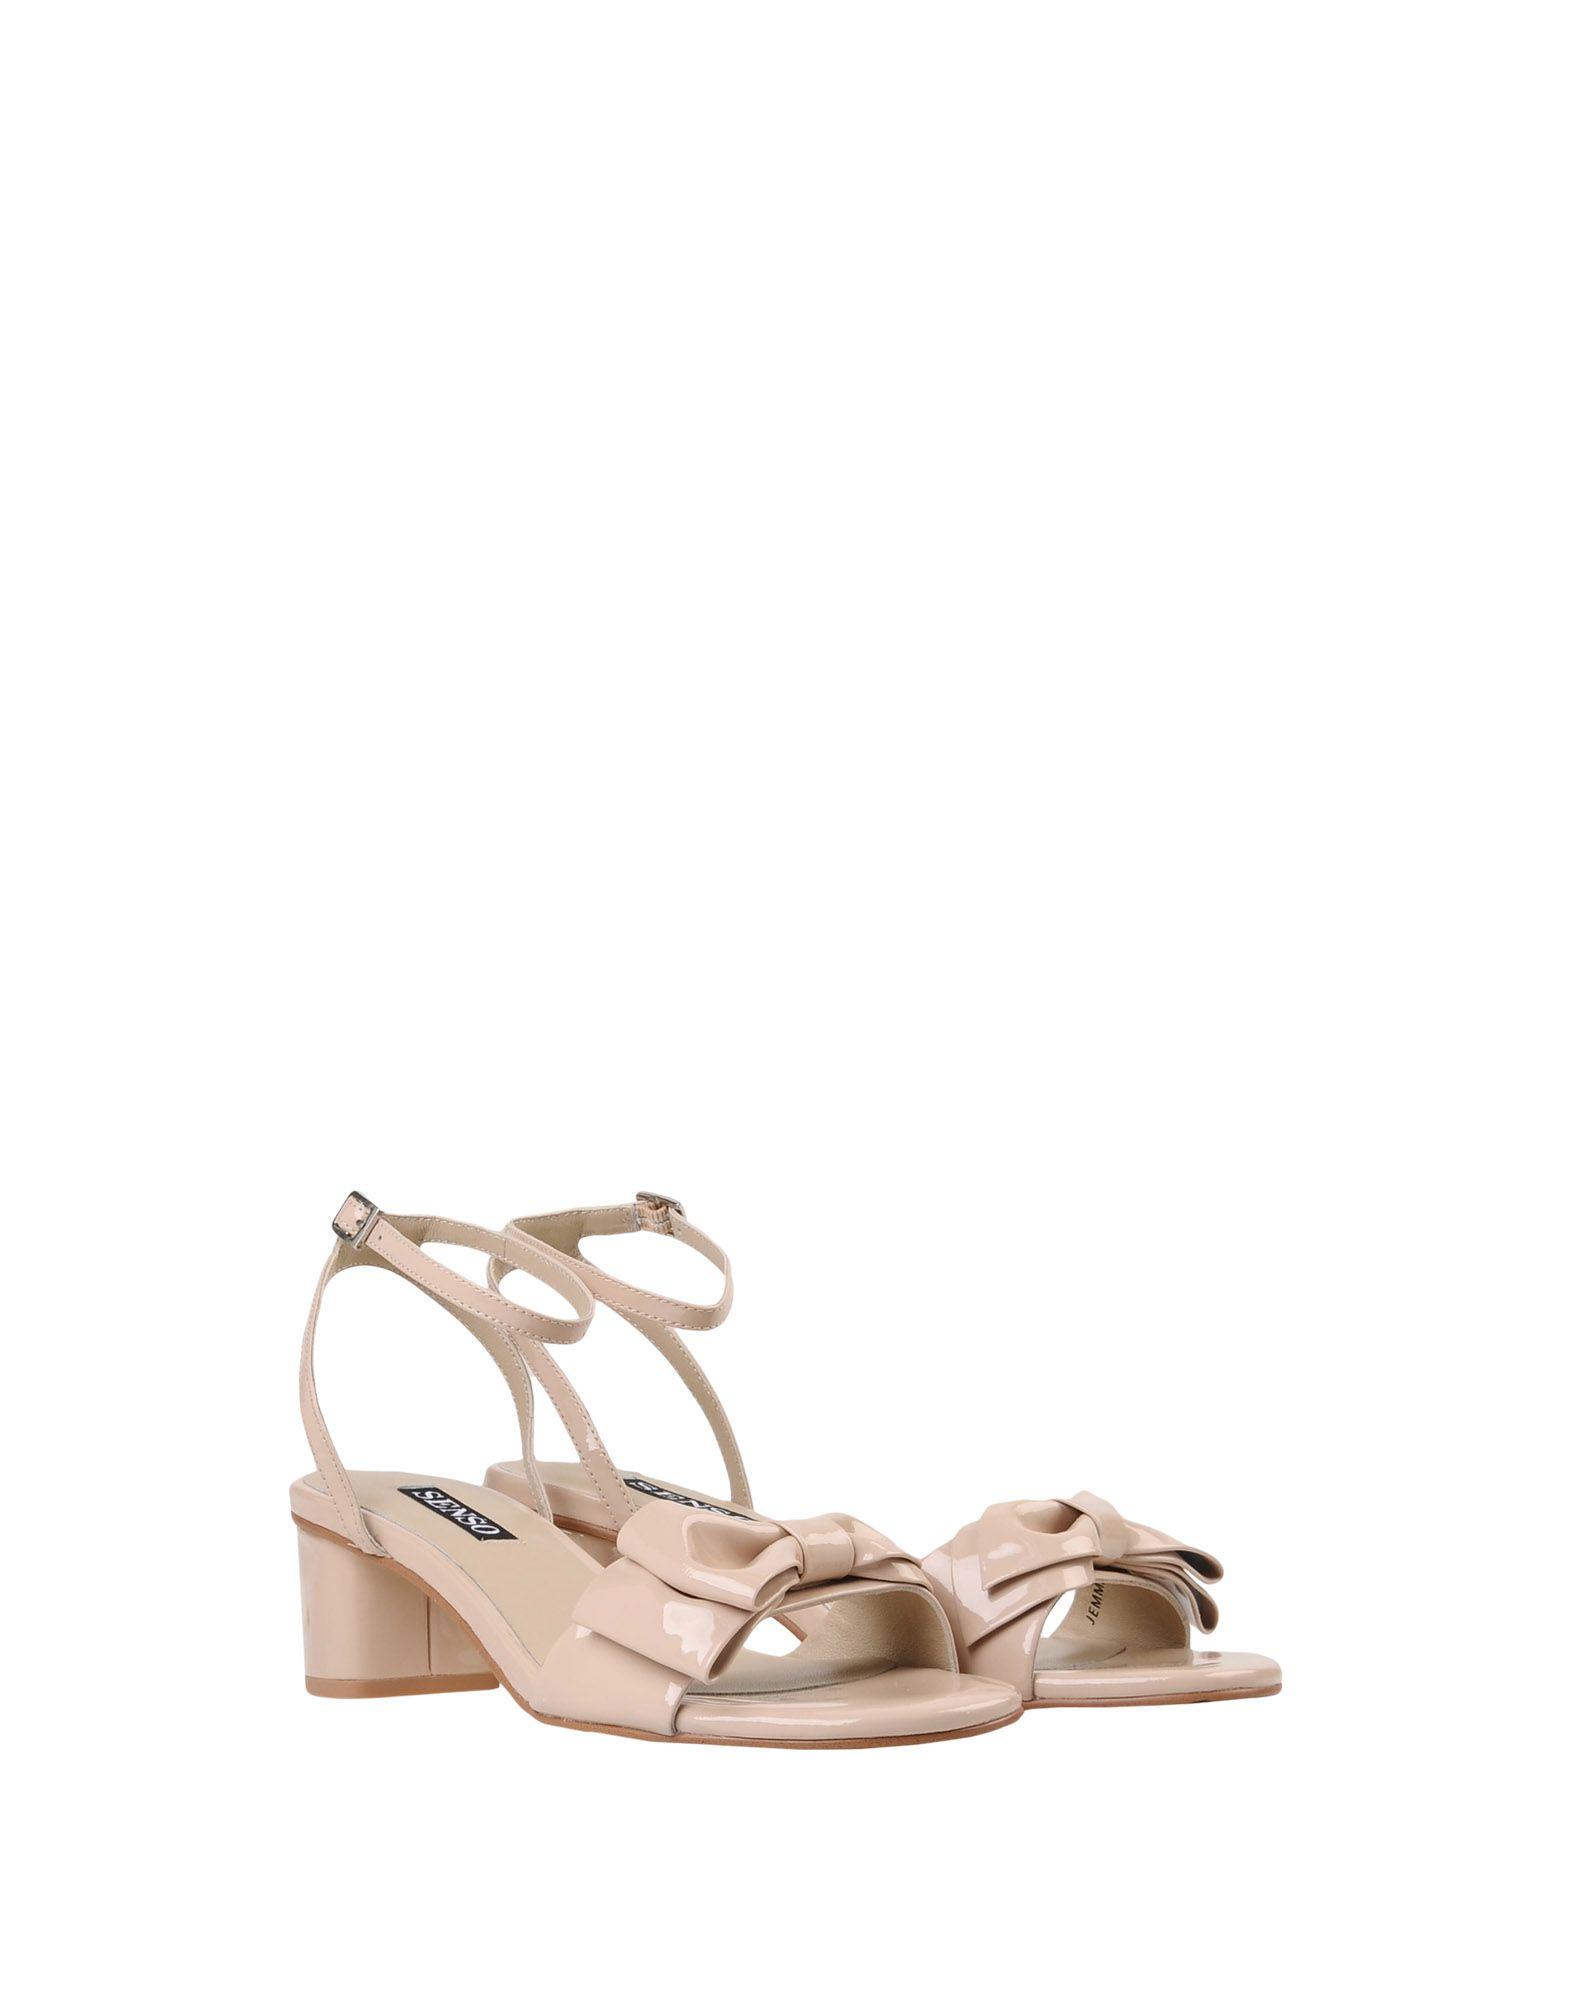 Stilvolle billige Schuhe Senso  Jemma I Patent Nude  Senso 11457645VG a2b142